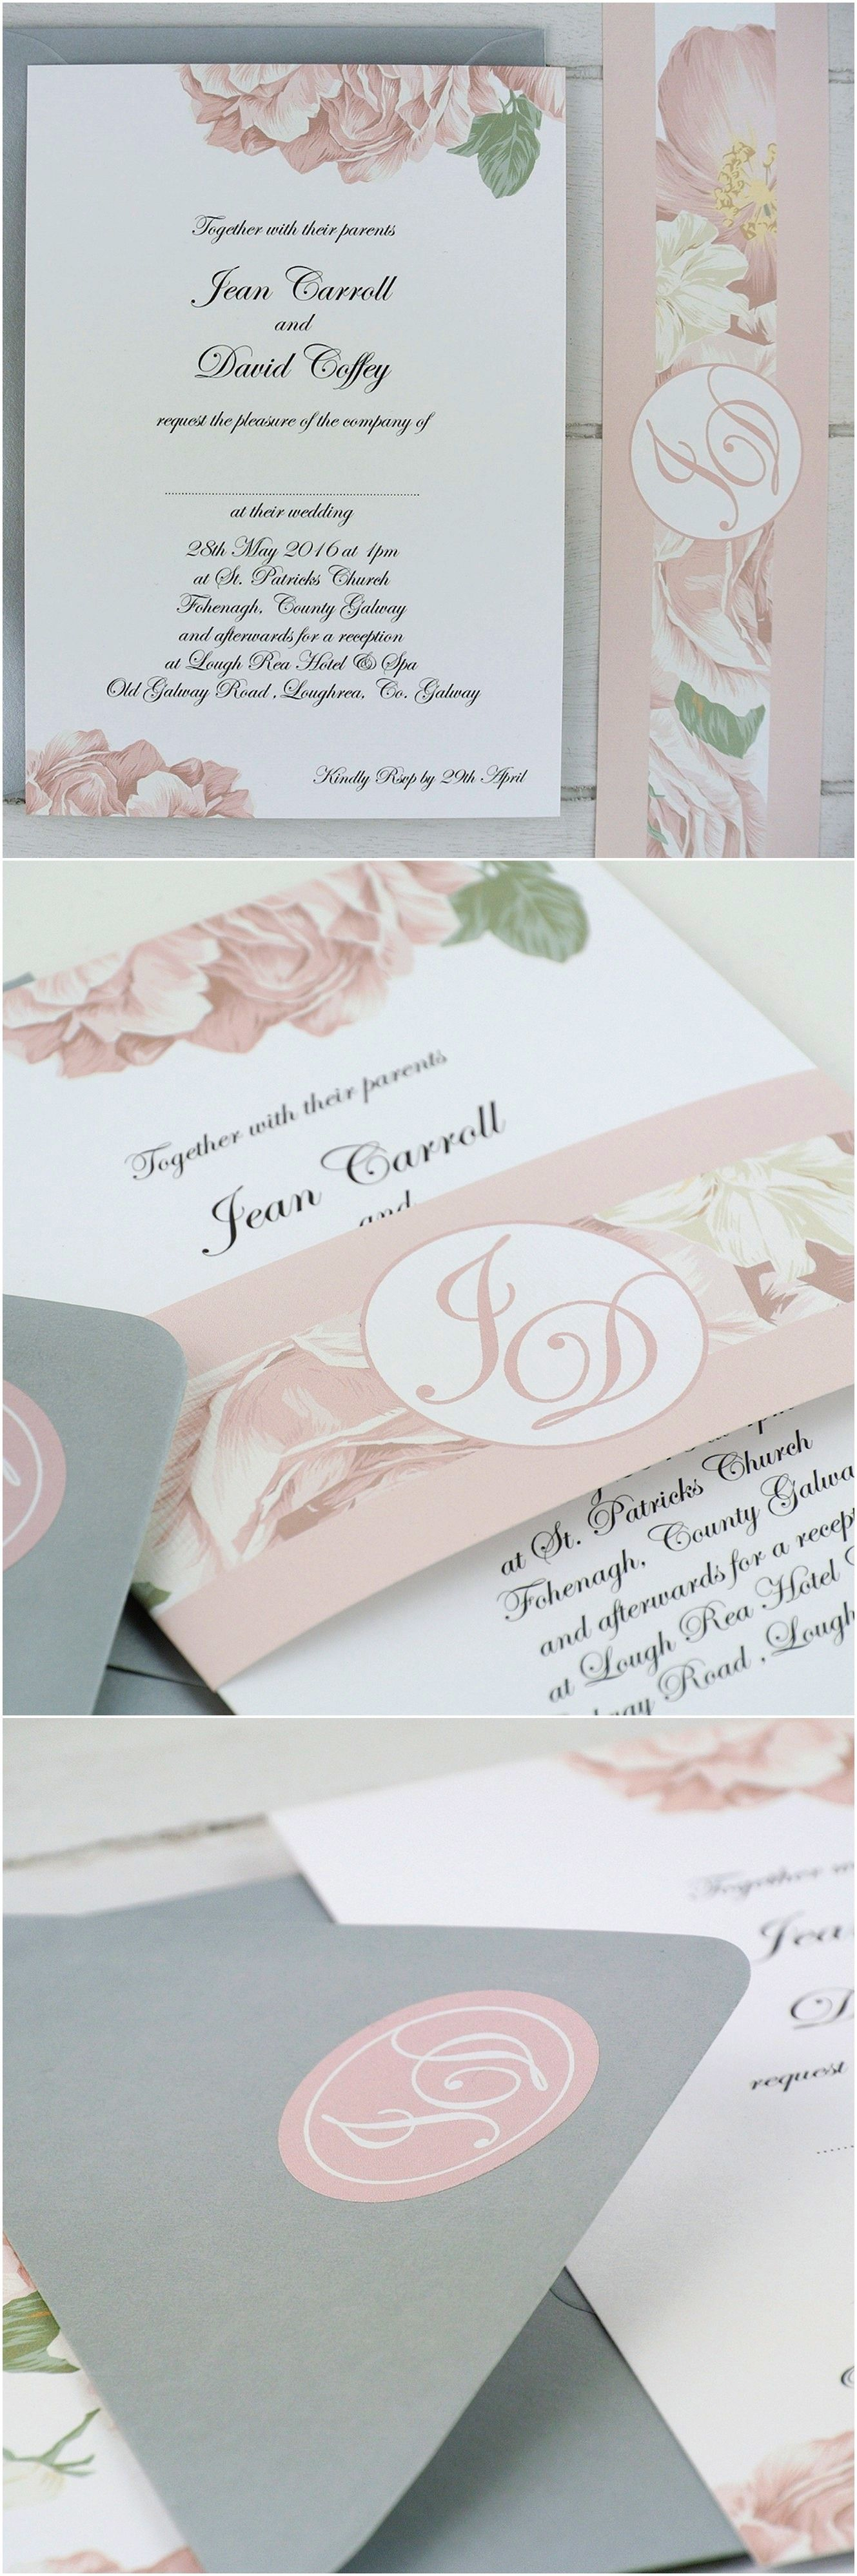 Wedding ideas for invitations traditional wedding invitation cards